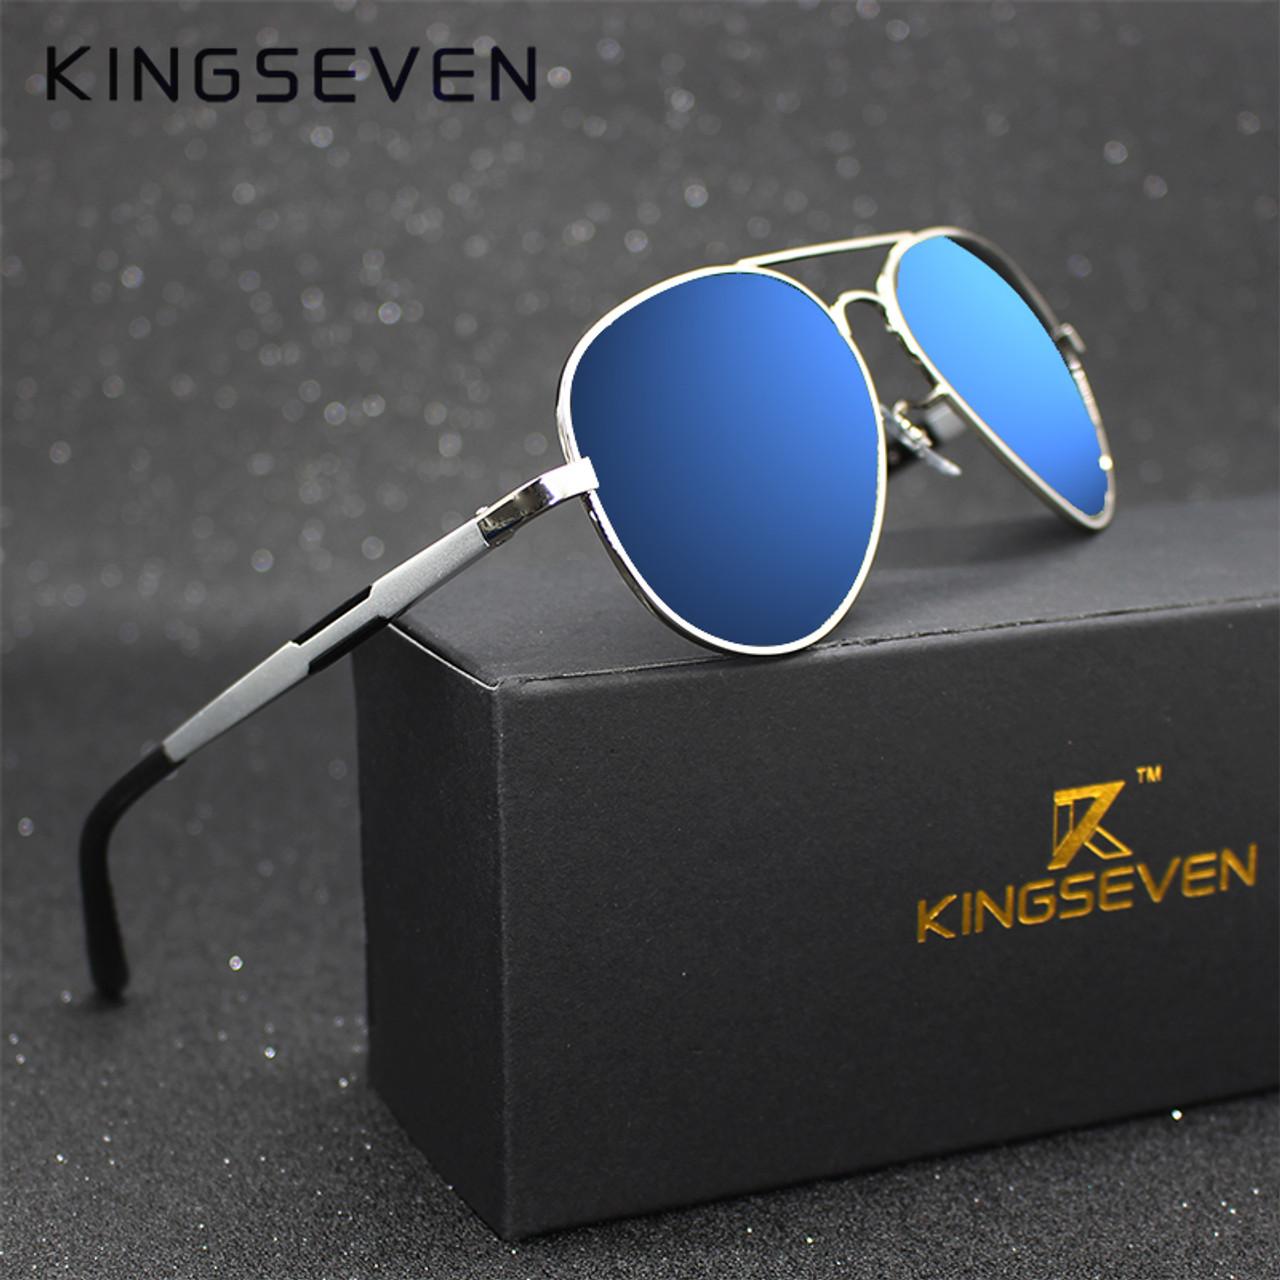 Kingseven Aluminum Magnesium Gold Fashion Polarized Lens Sunglasses Men Women  Driving Mirror Sun Glasses Points Male Oculos 7170 - OnshopDeals.Com 21ab55e988